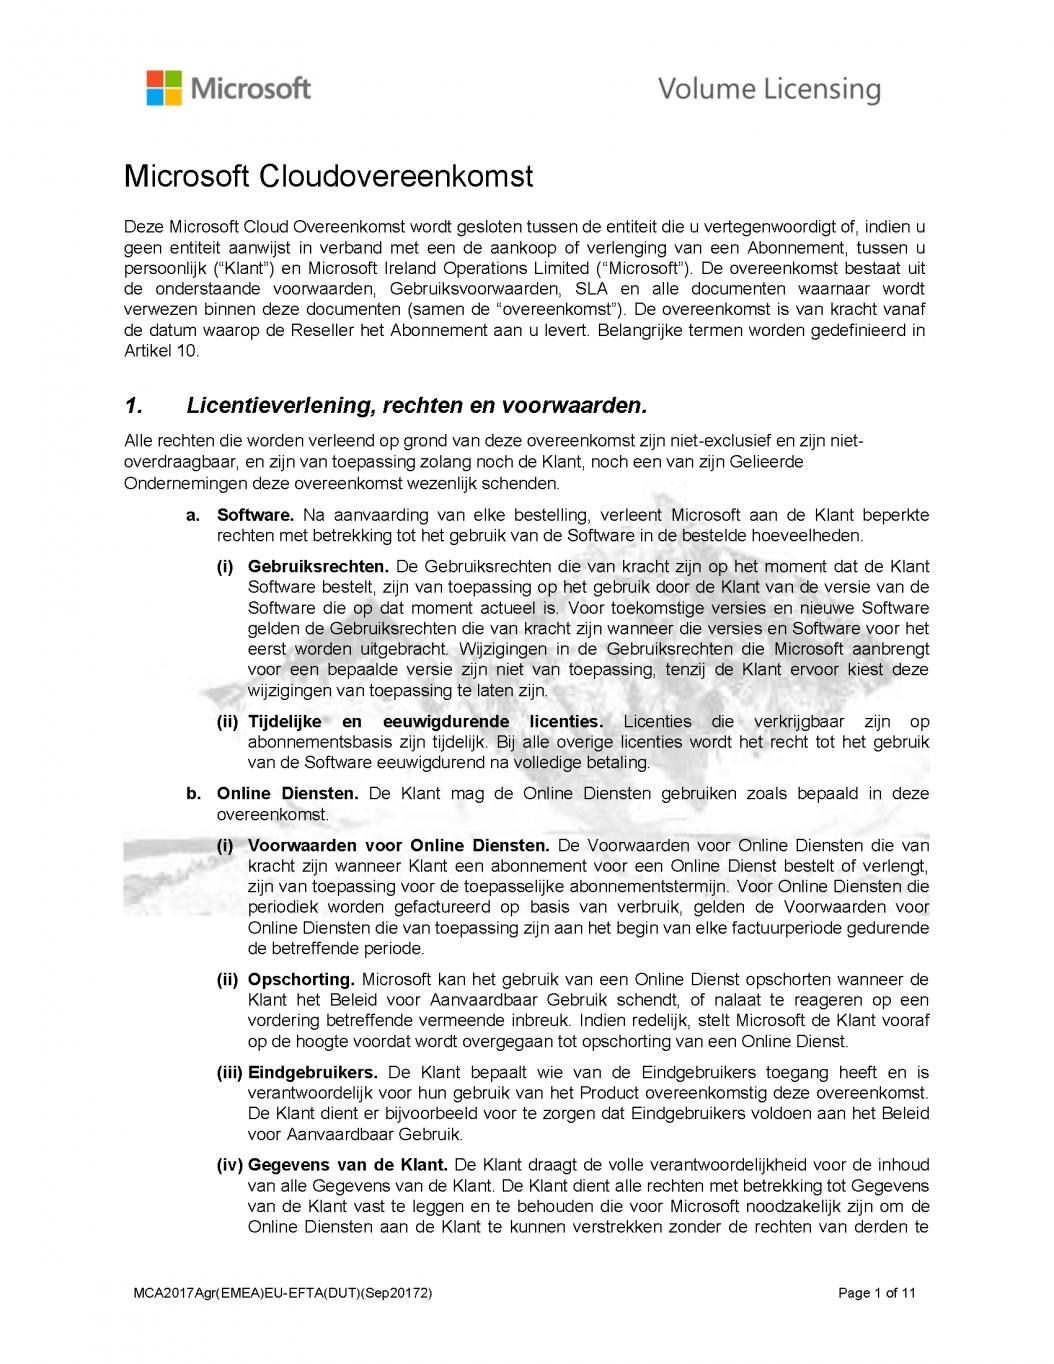 Microsoft MCA 2017 Dutch_Page_01